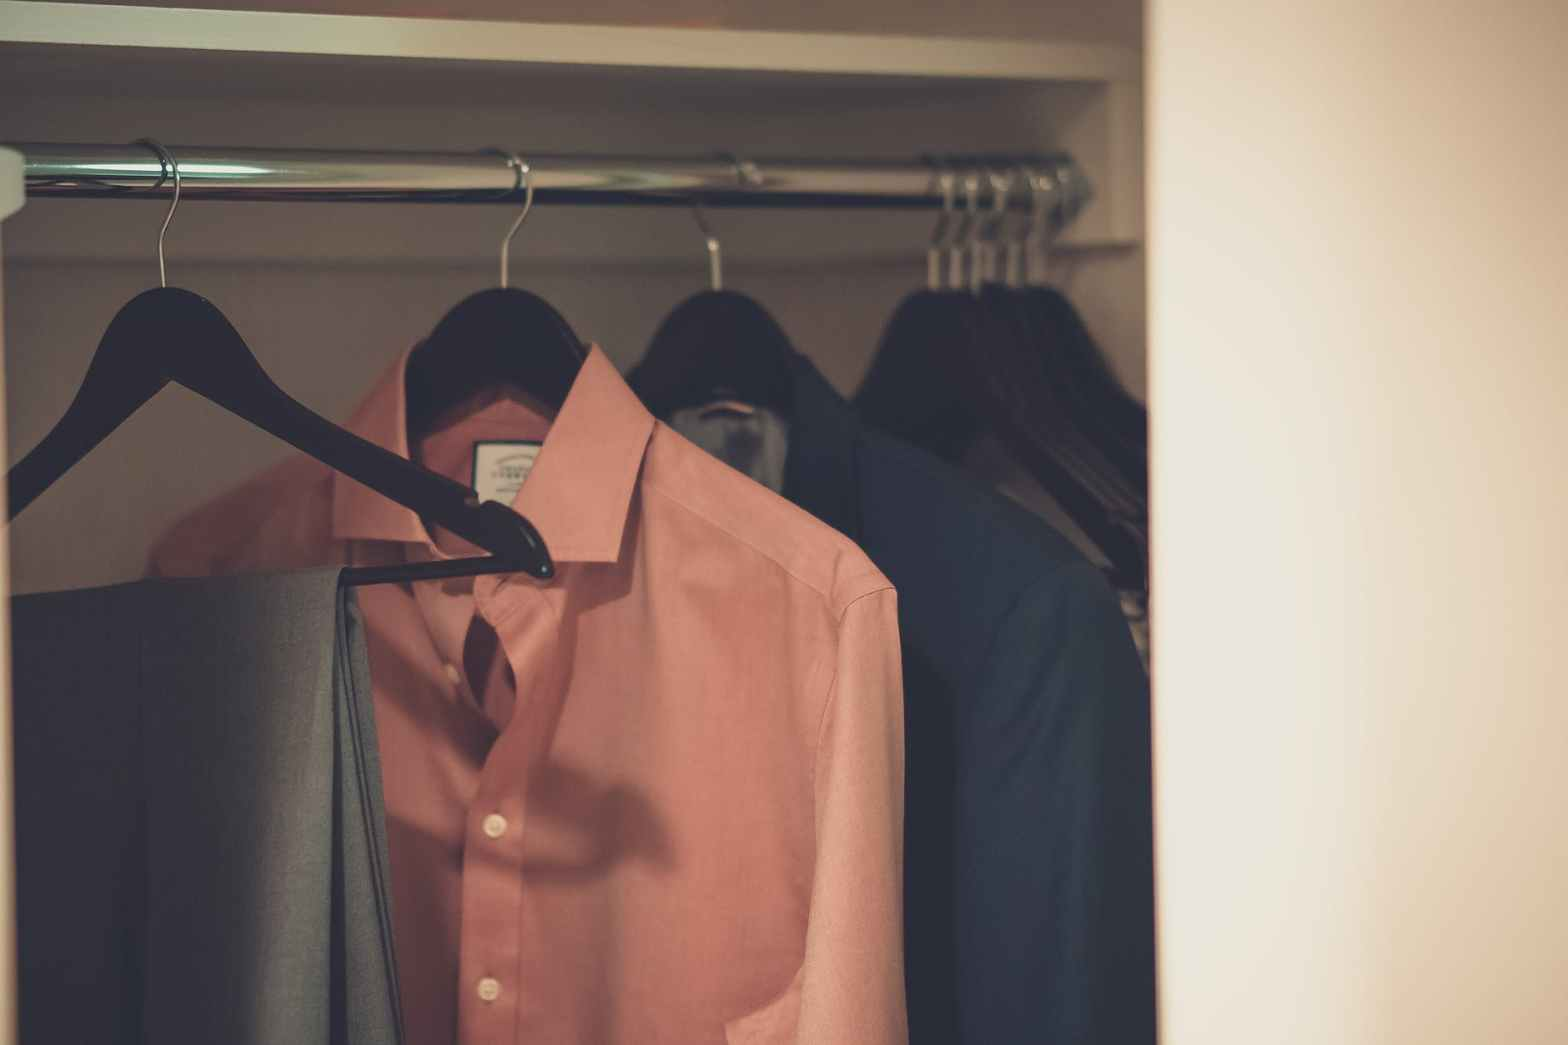 close up photo of hang clothes in wardrobe